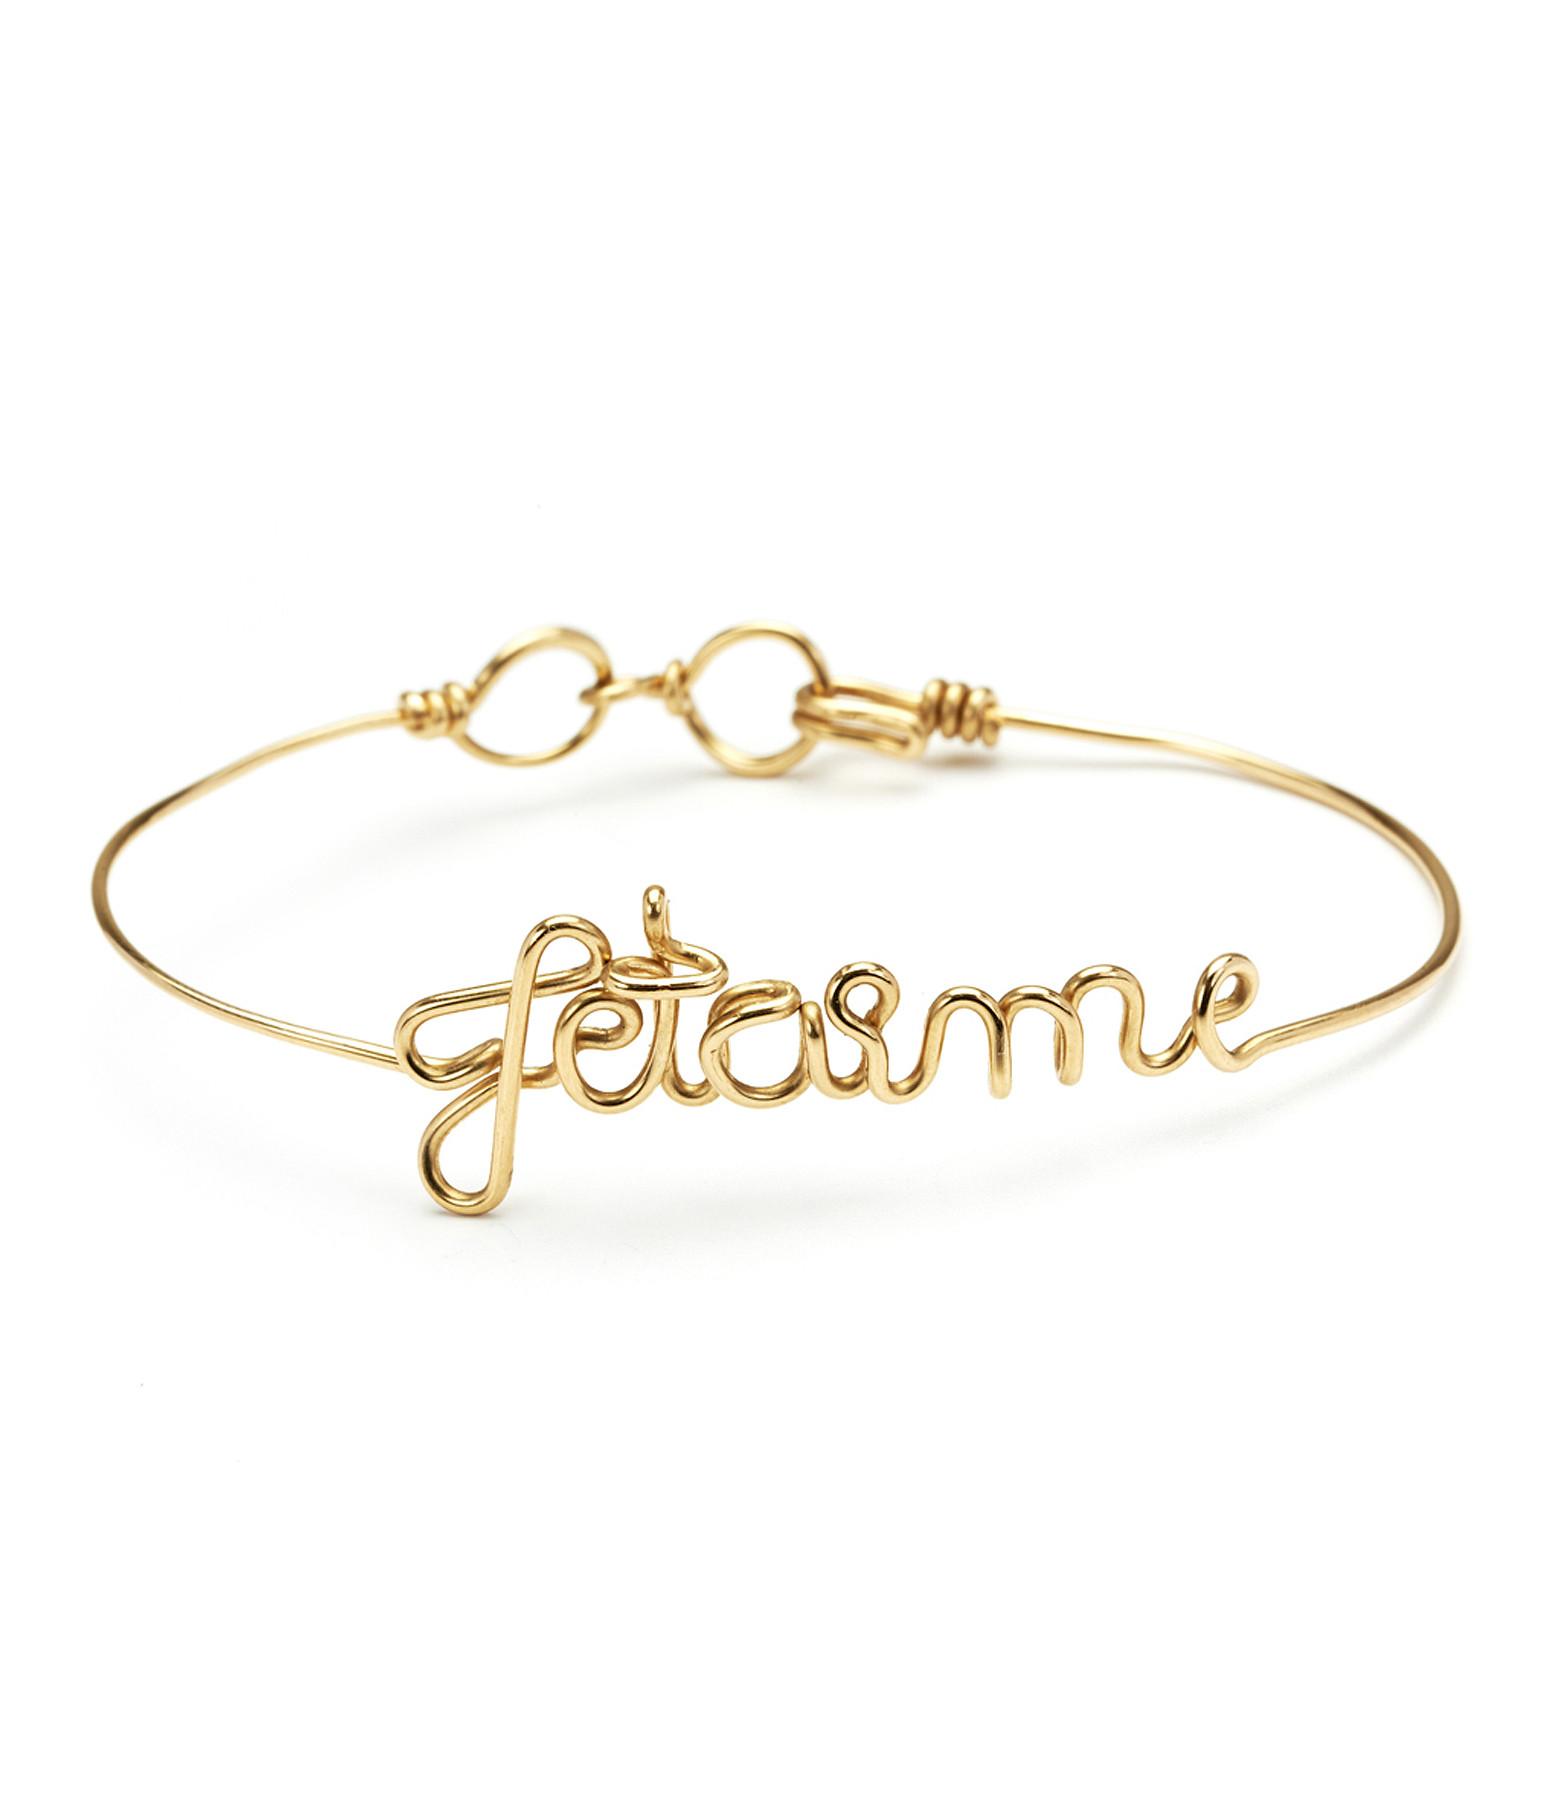 Bracelet Fil Jetaime Gold Filled - ATELIER PAULIN